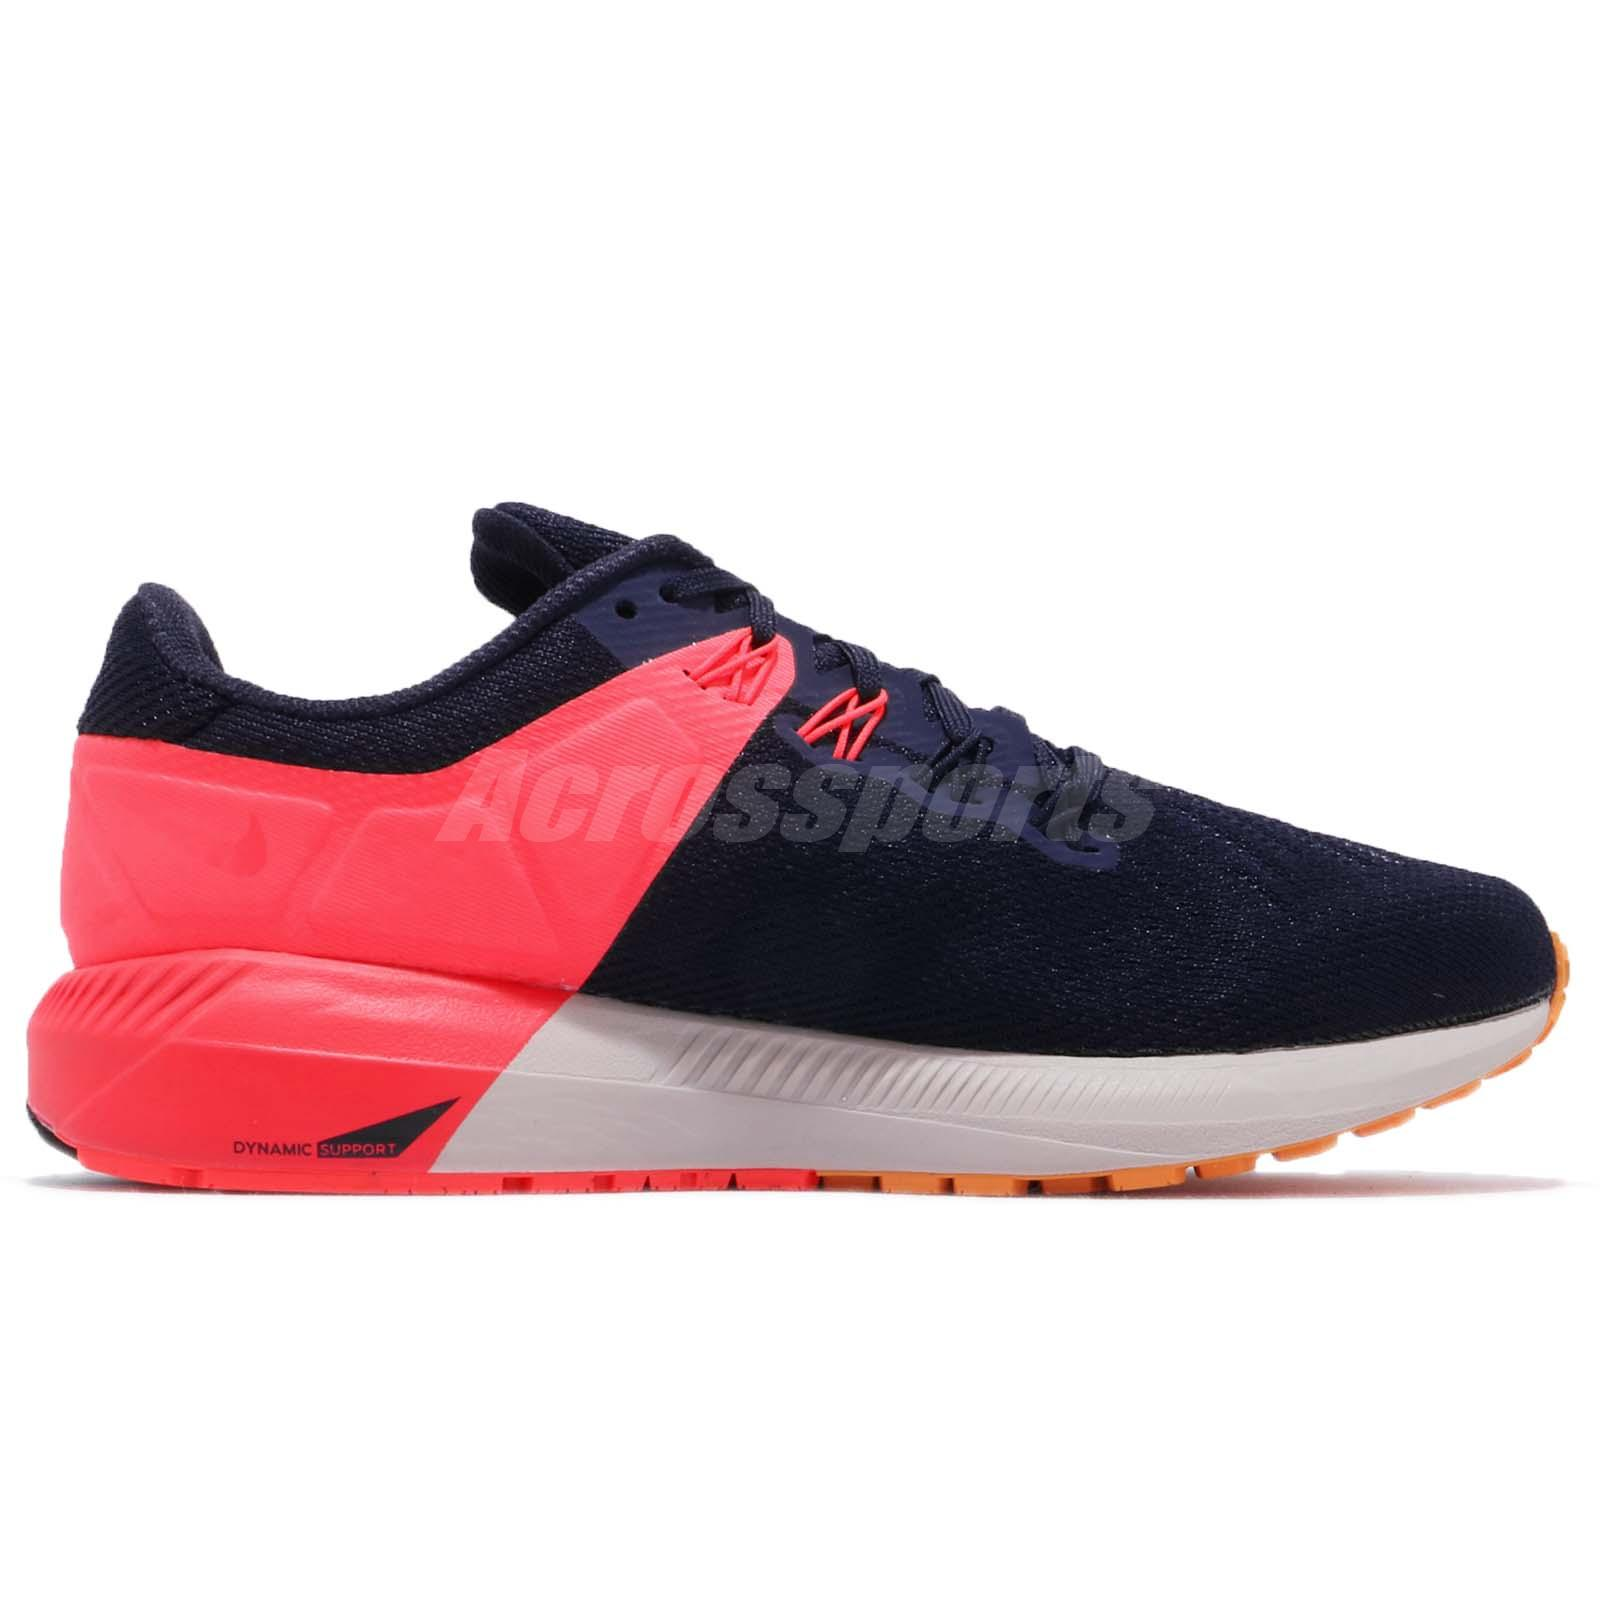 864fdb716036 Nike Wmns Air Zoom Structure 22 Blackened Blue Orange Women Shoes ...